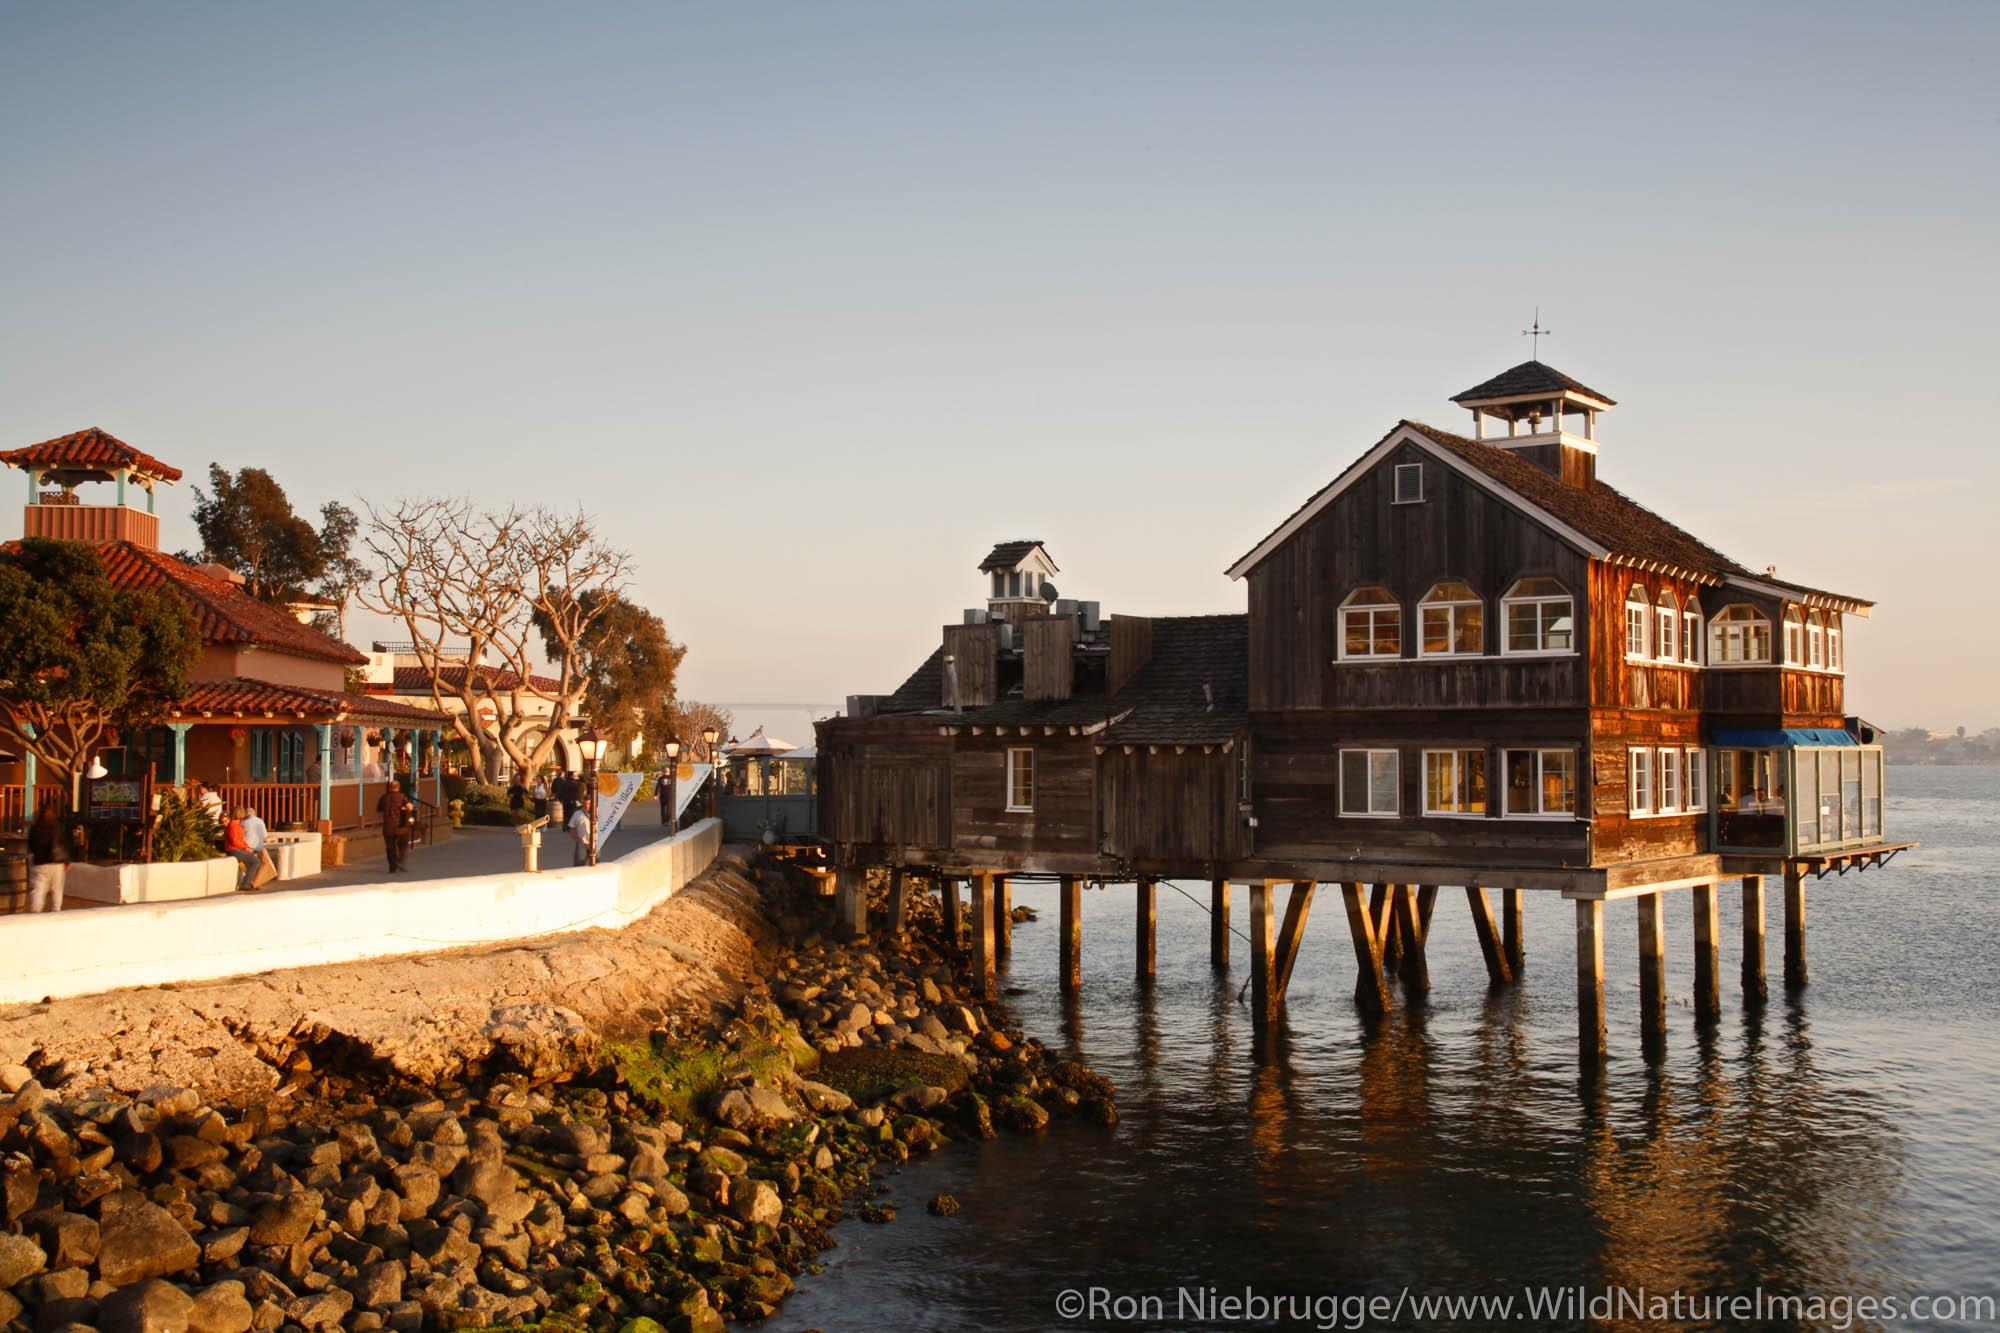 The San Diego Pier Cafe in Seaport Village, San Diego, California.